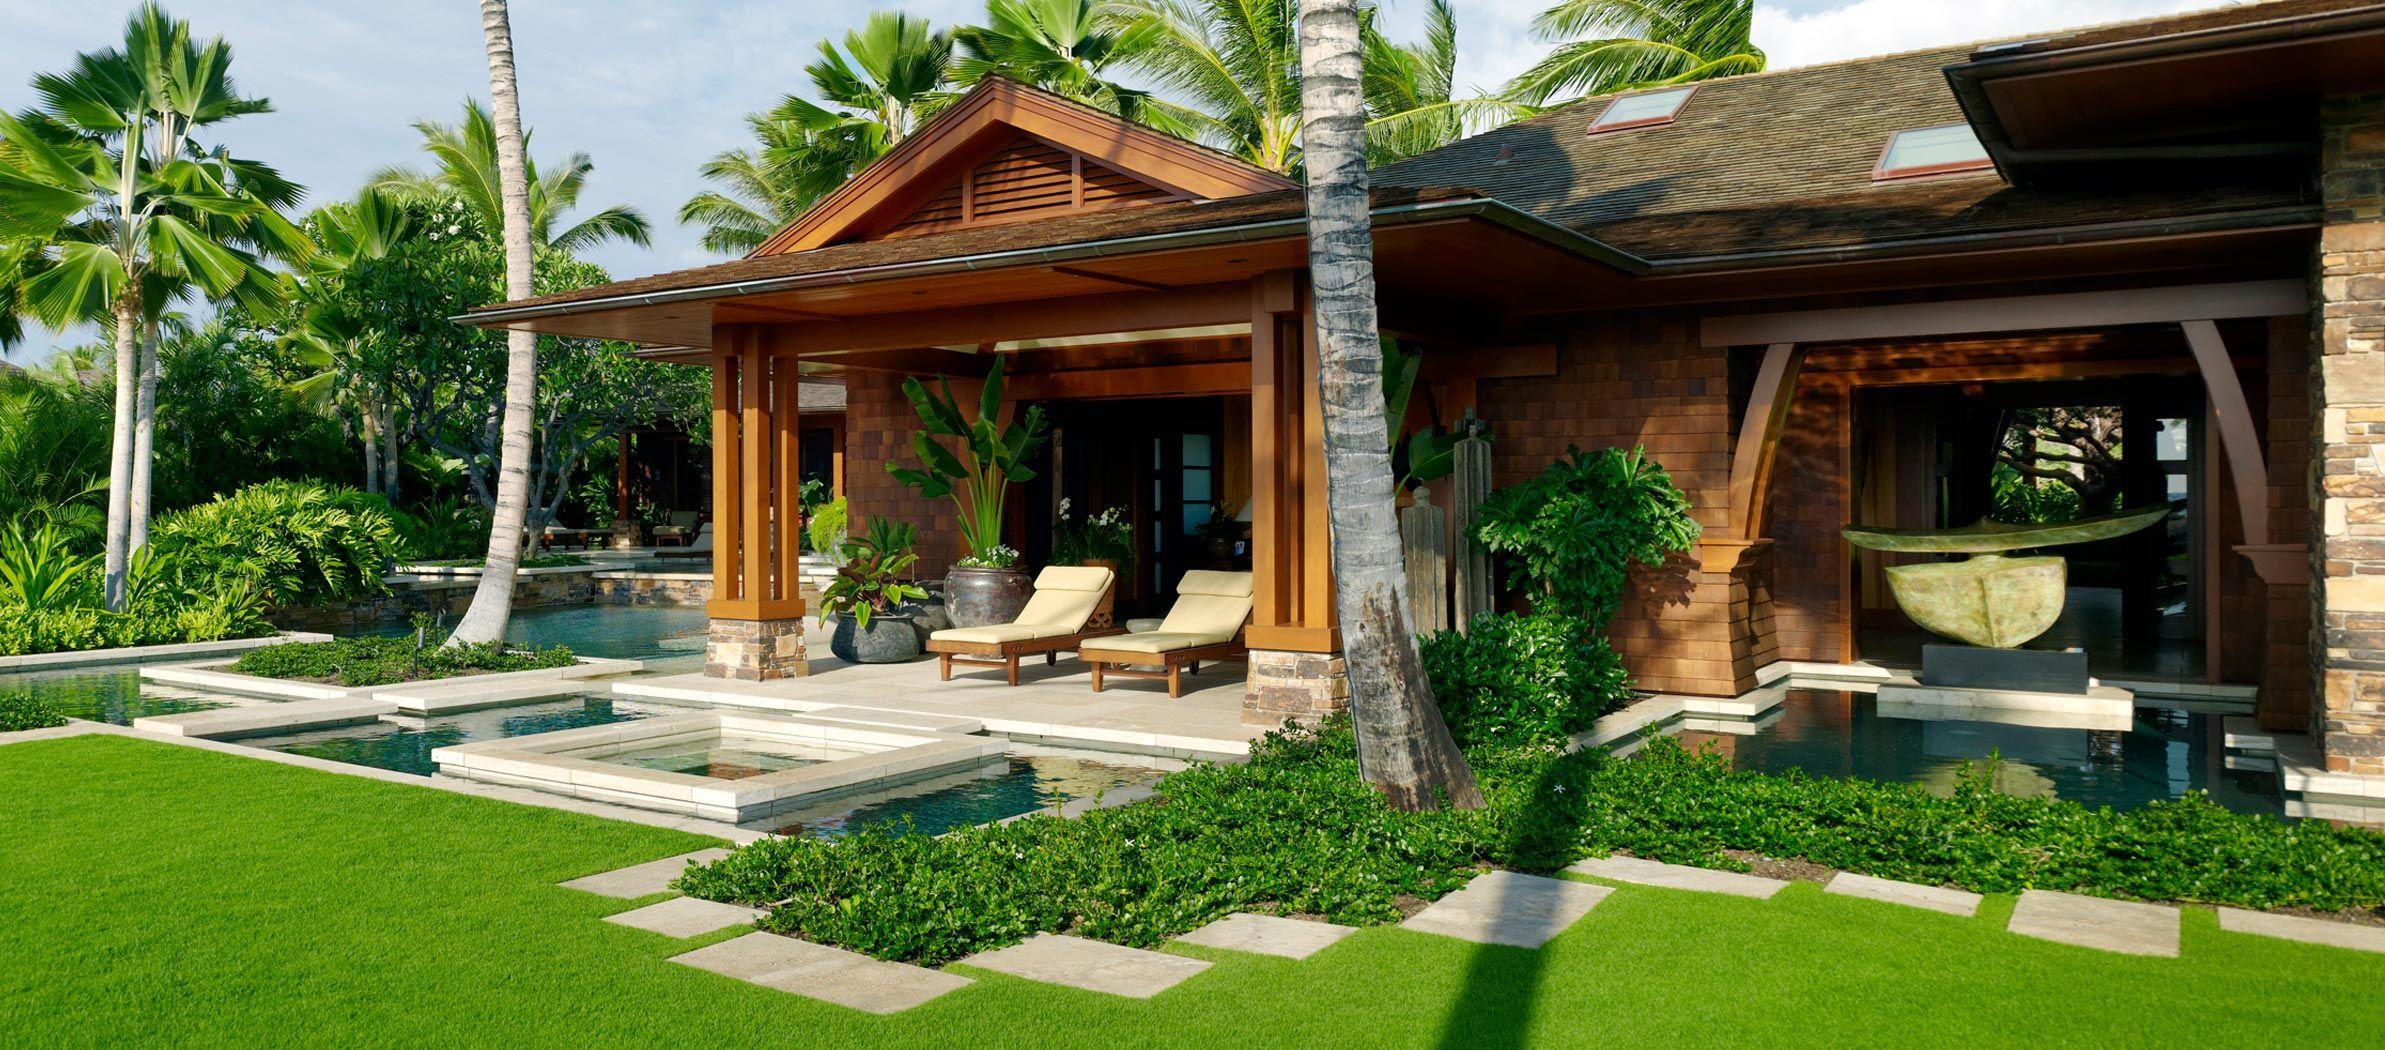 Tropical Craftsman Home Big Island Hawaii De Reus Architects Craftsman House Hawaiian Homes Craftsman House Plans